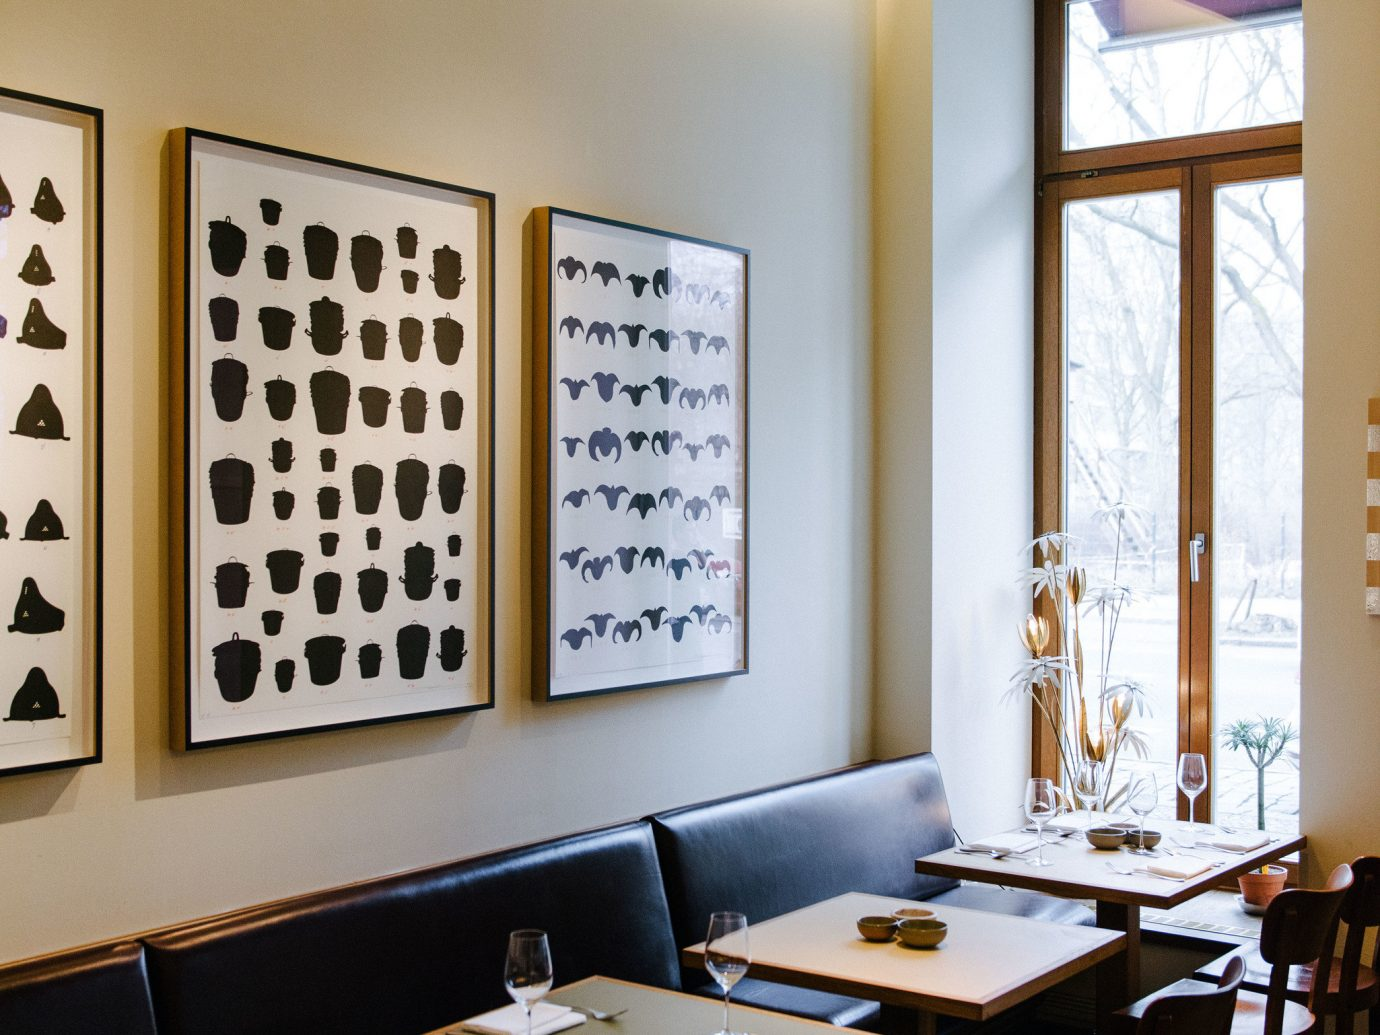 Trip Ideas indoor wall floor ceiling window restaurant room table interior design furniture café